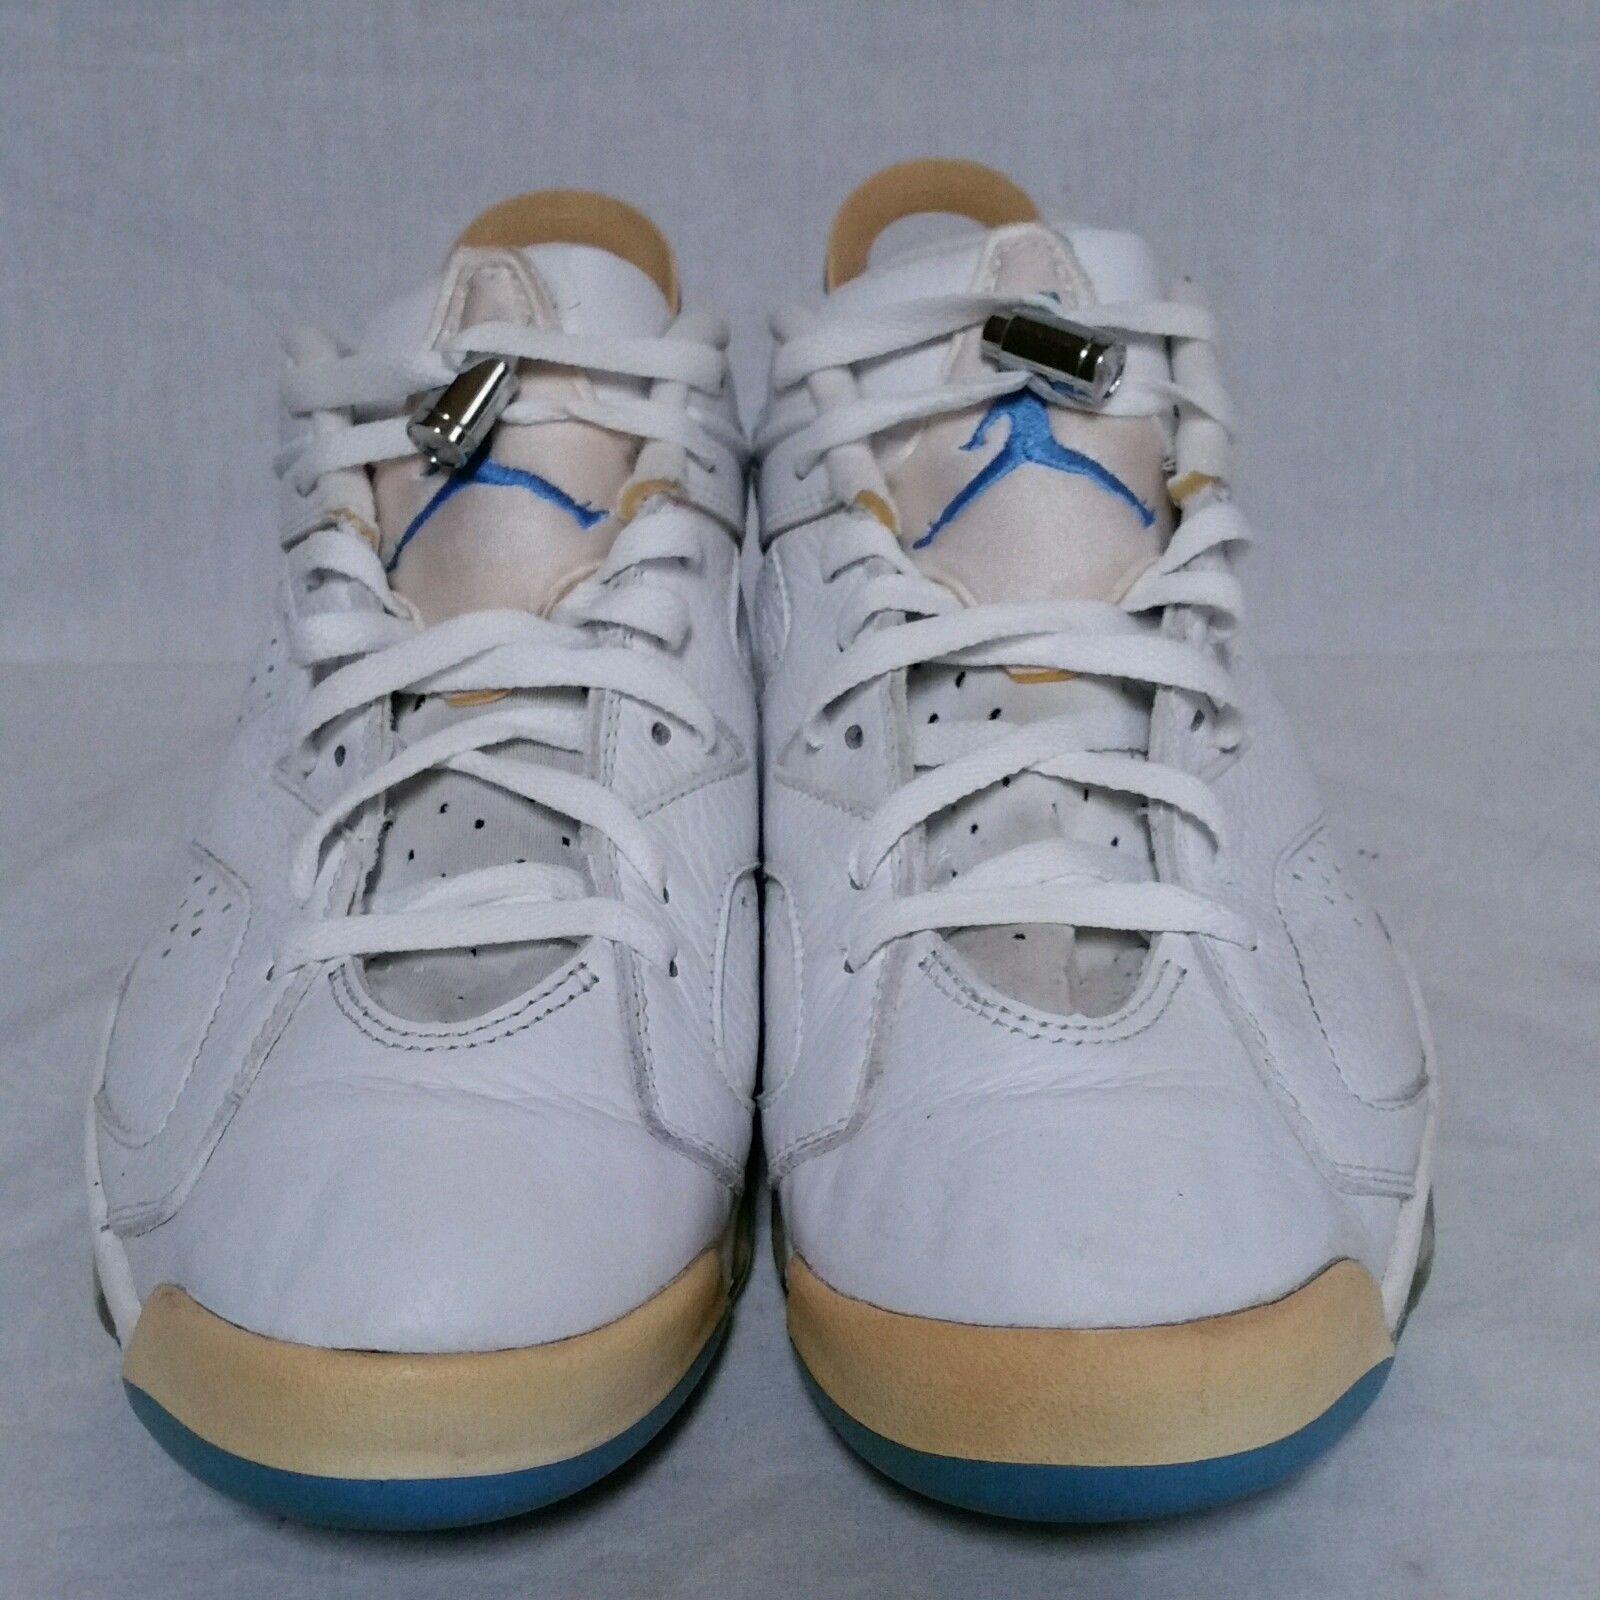 1c38abc388a1 Nike Air Jordan Retro 6 vi Low Carolina UNC University Infrared Chrome Mens  12